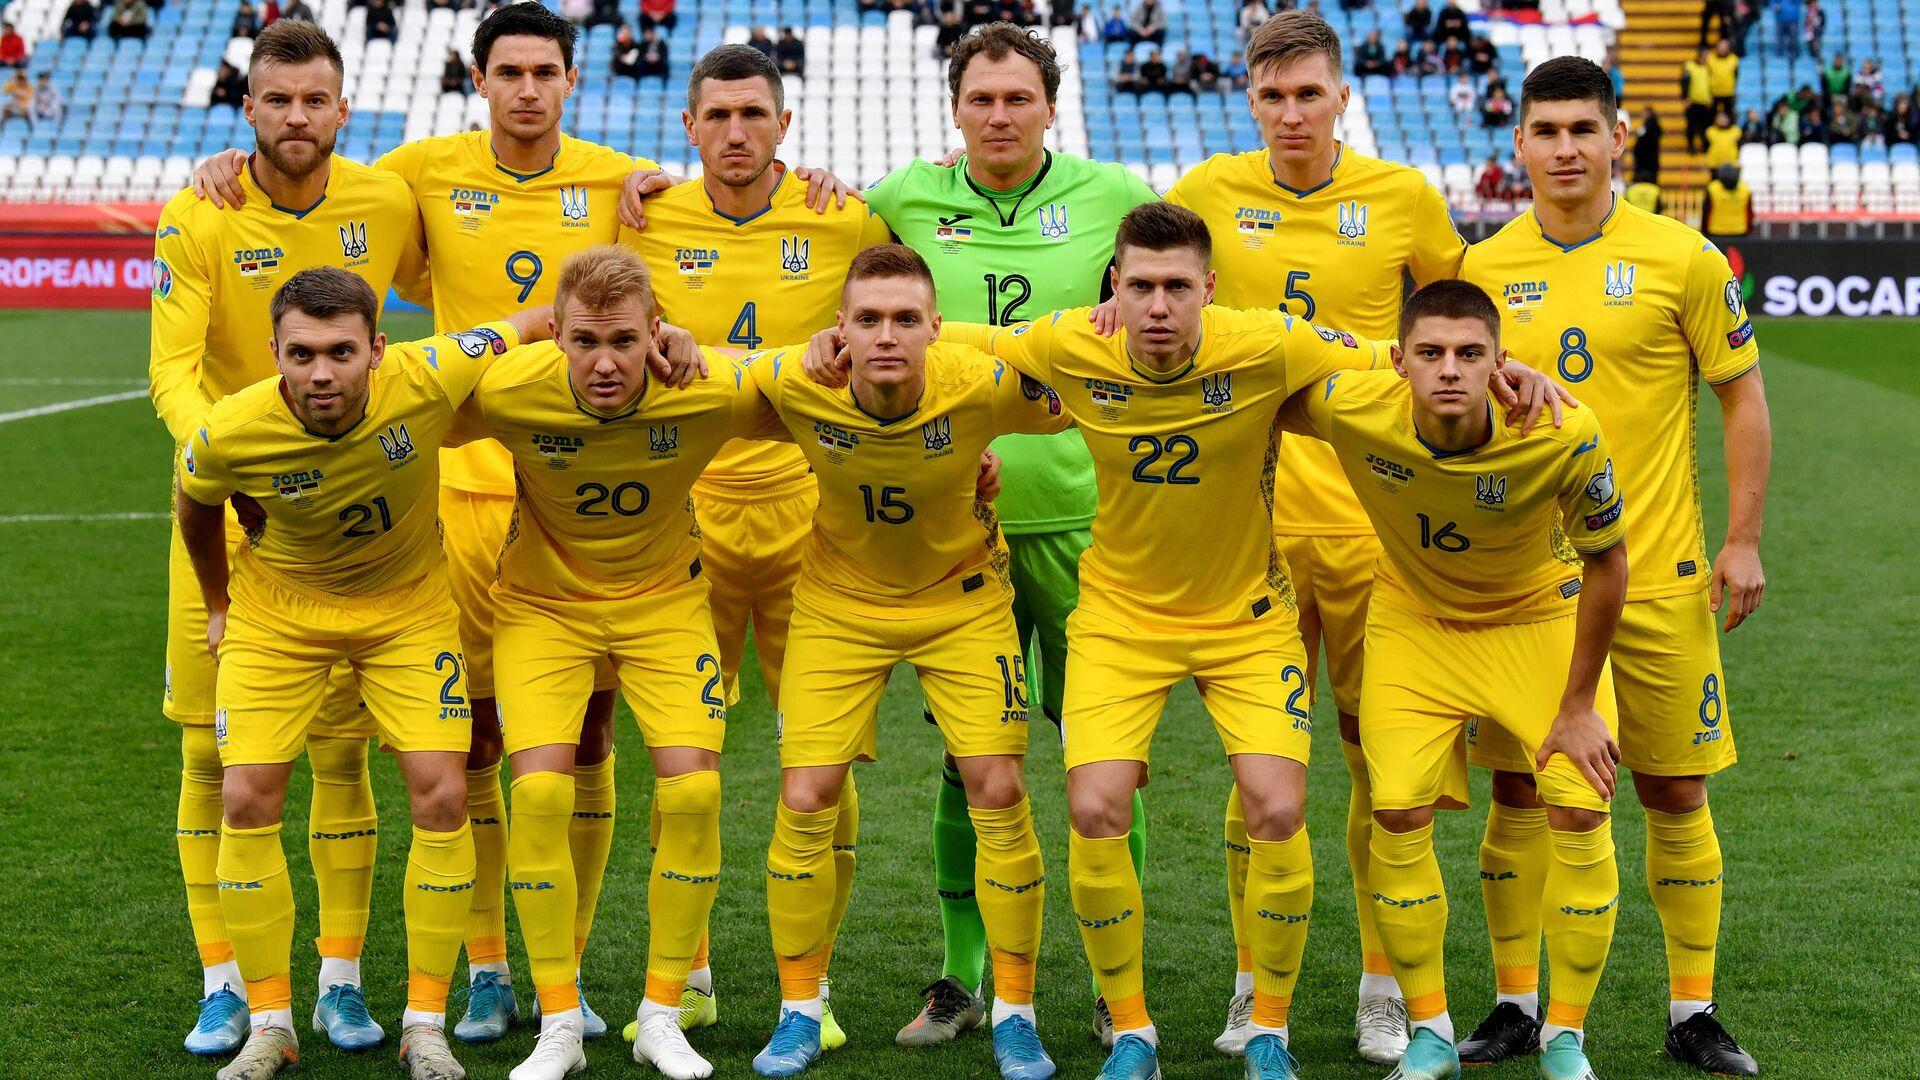 Участники Евро-2020: Украина - РИА Новости, 19.02.2021